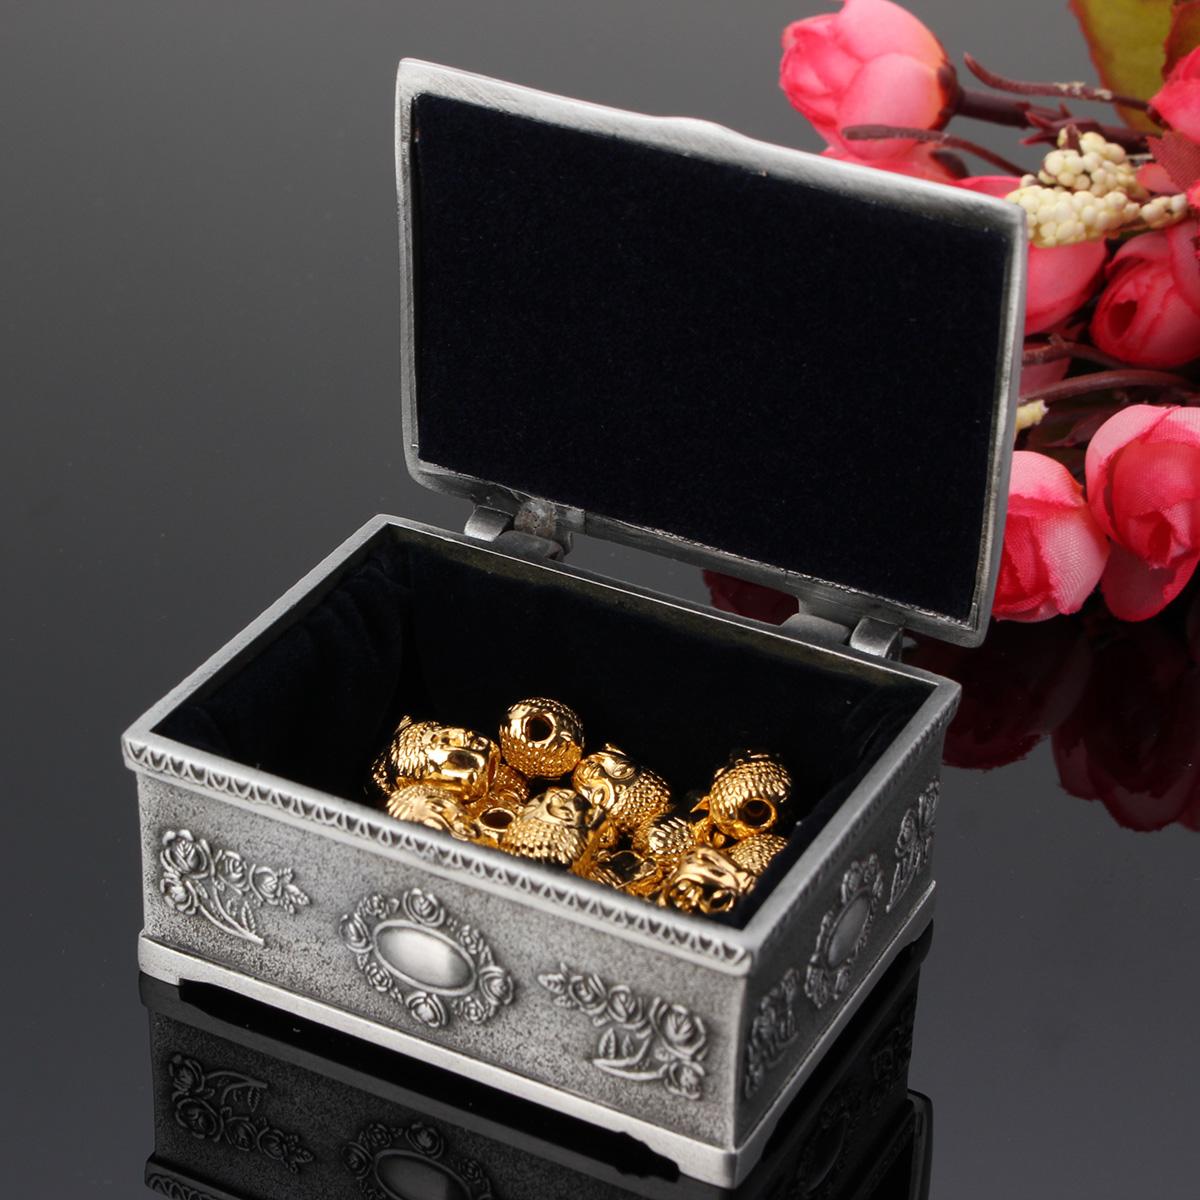 Vintage Bracelet Earrings Necklace Jewelry Gift Storage Box Case Holder